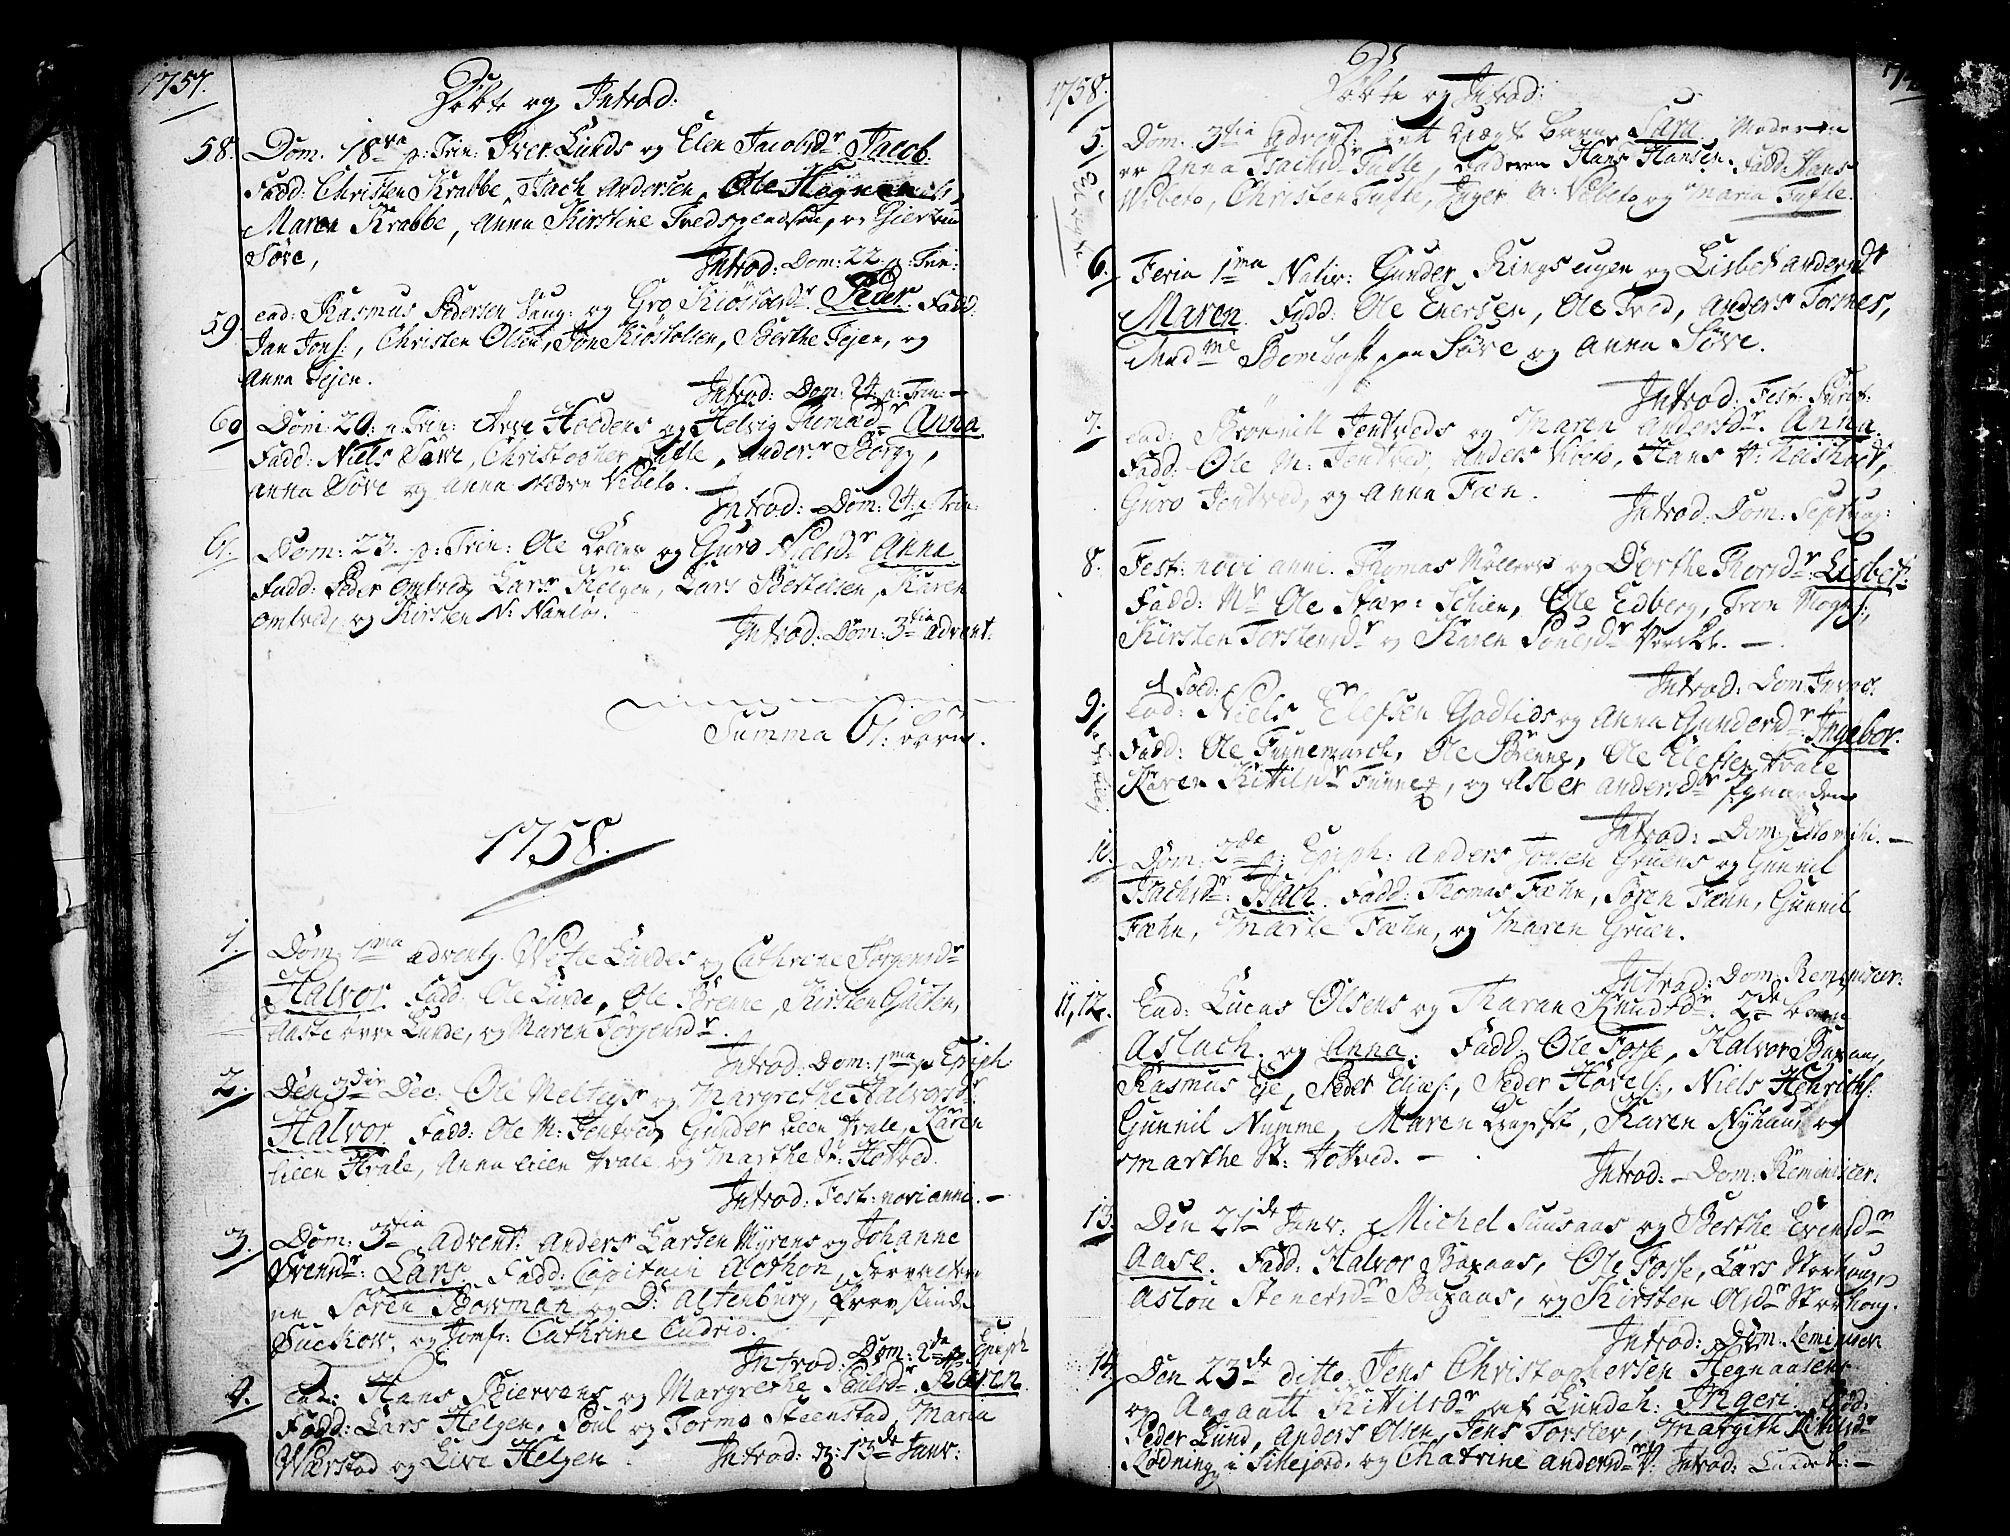 SAKO, Holla kirkebøker, F/Fa/L0001: Ministerialbok nr. 1, 1717-1779, s. 74